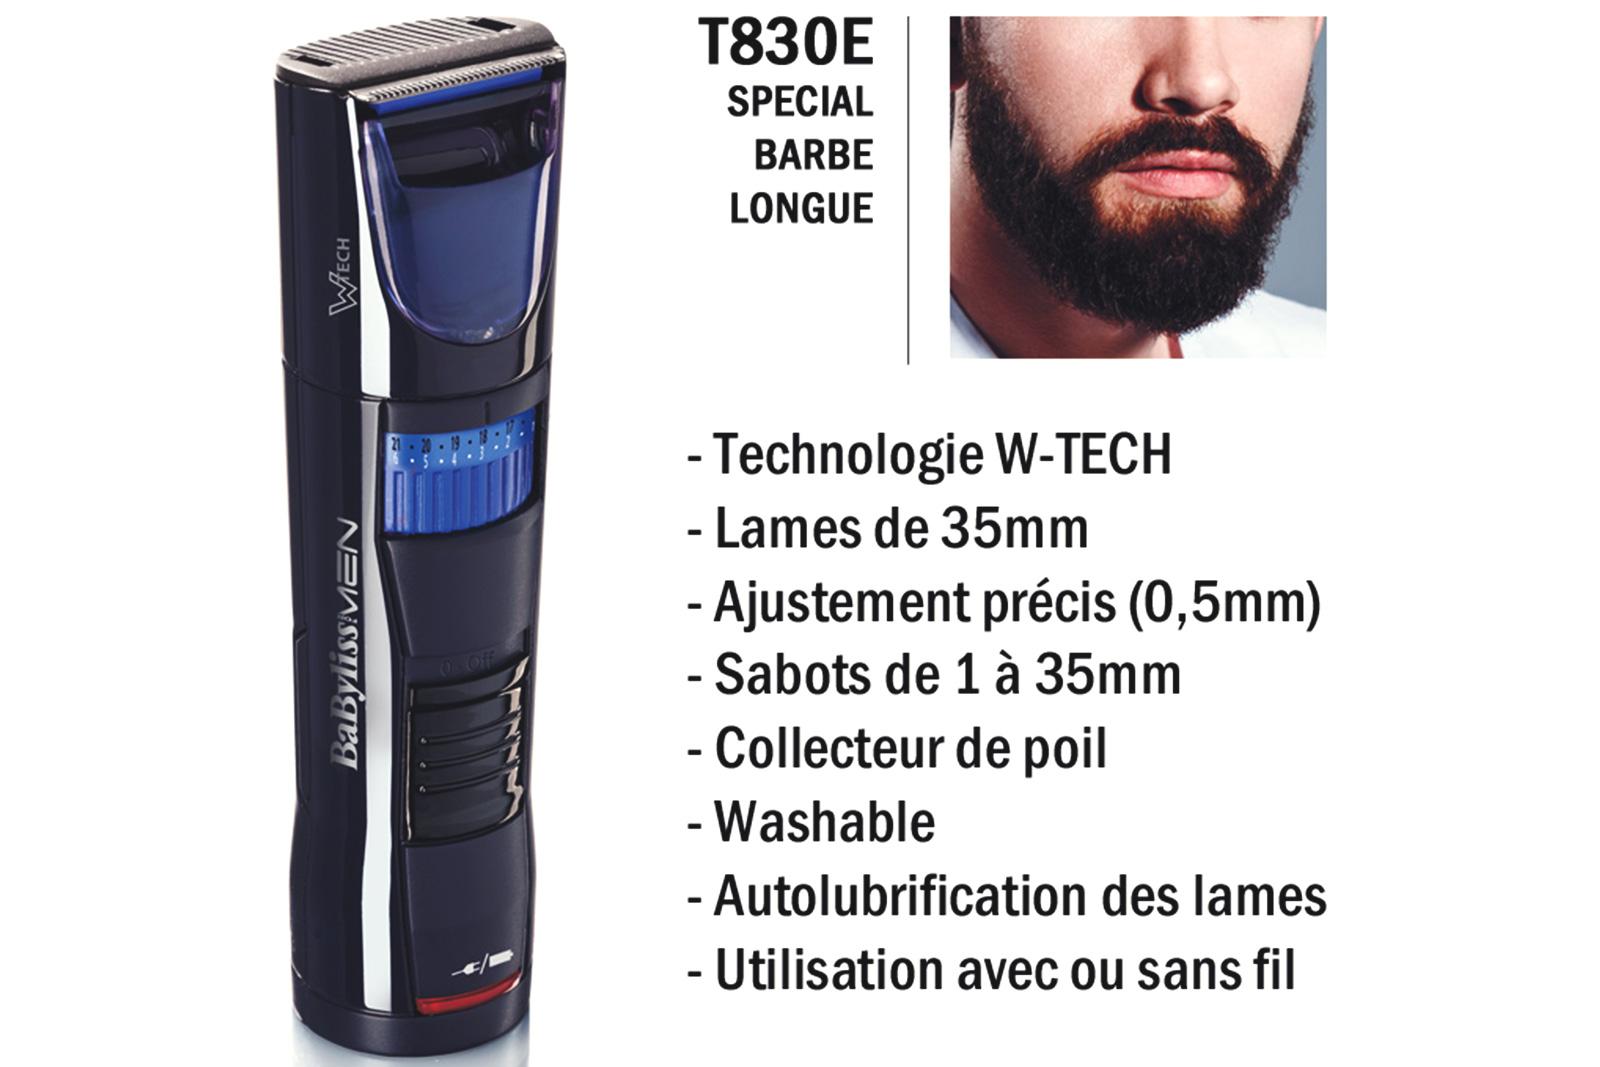 Tondeuse Babyliss T830e